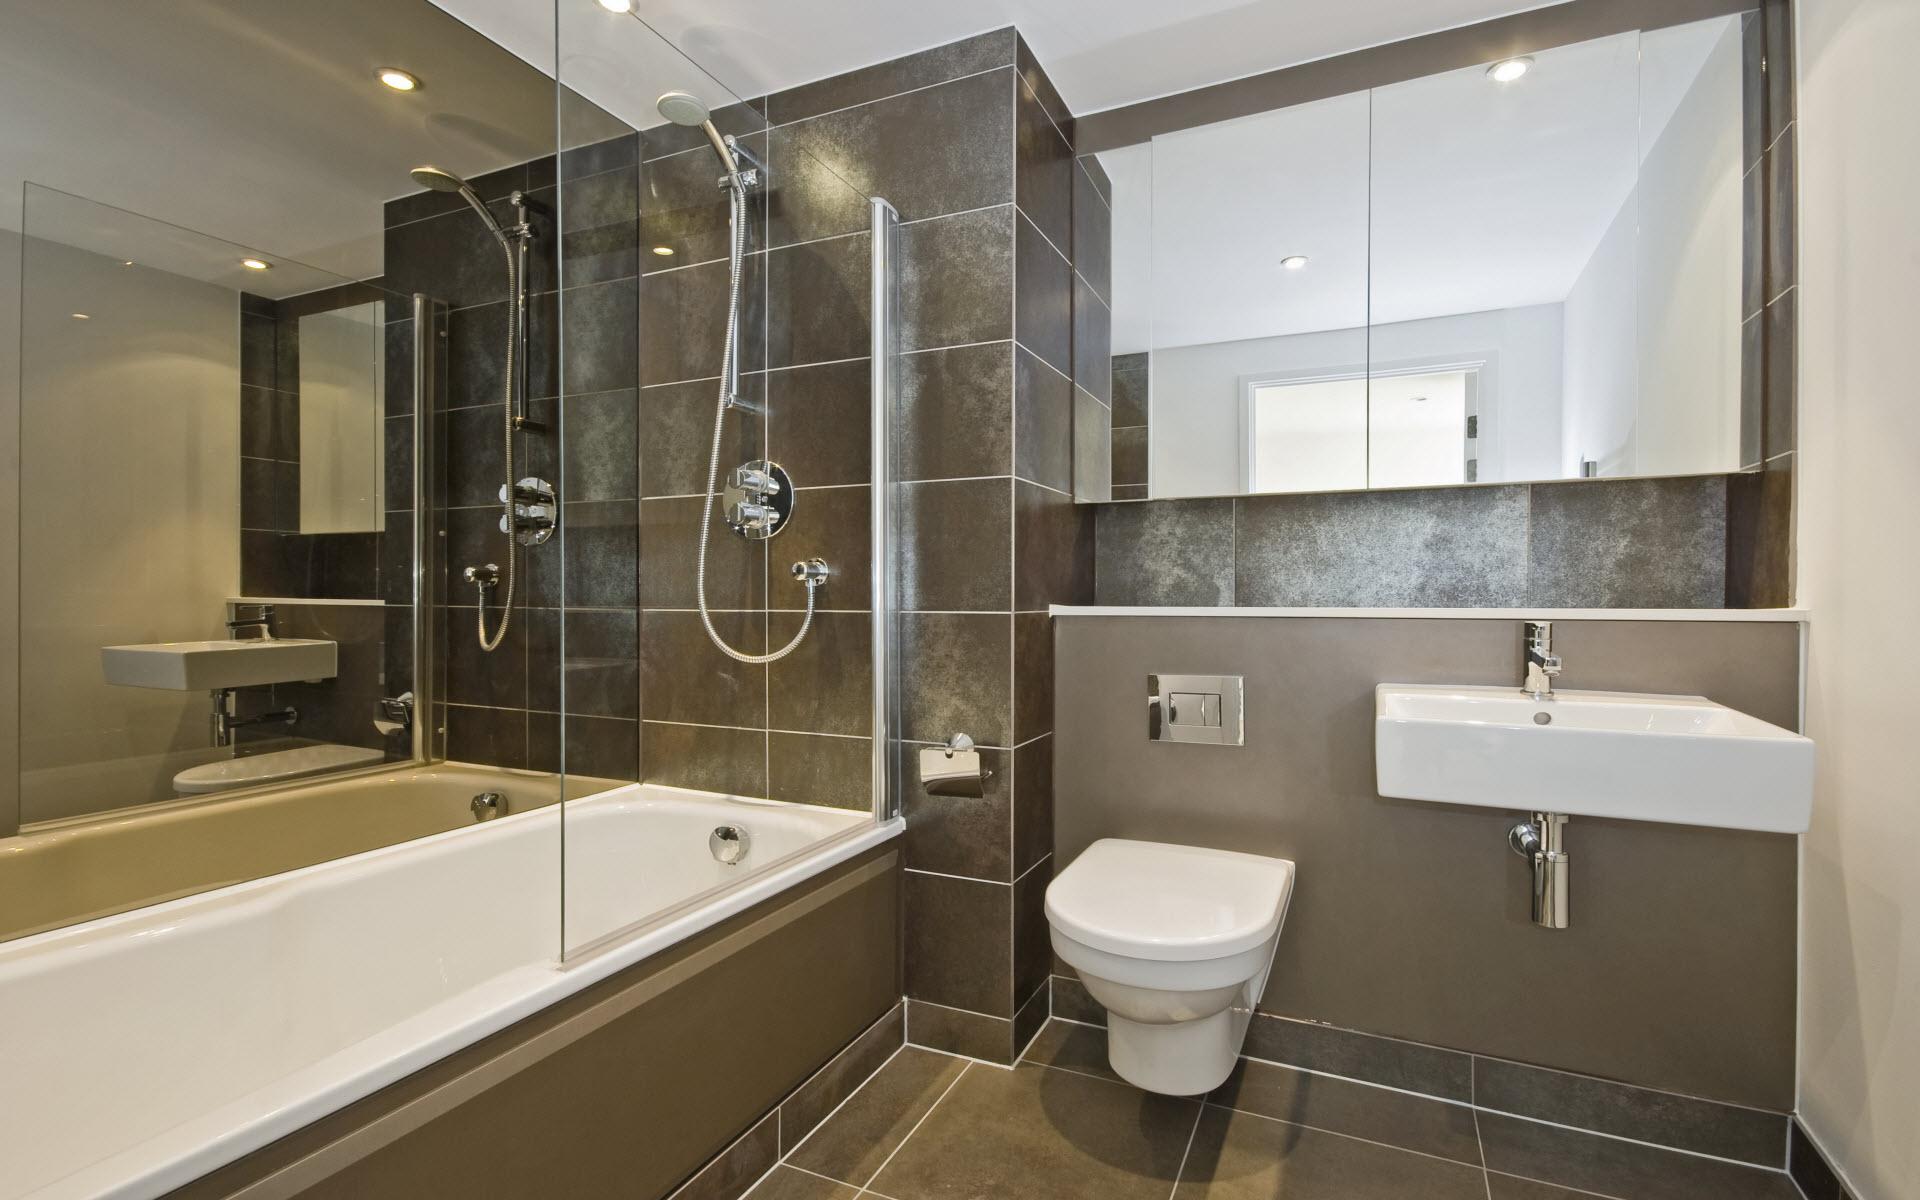 Дизайн ванной комнаты 3 кв м.